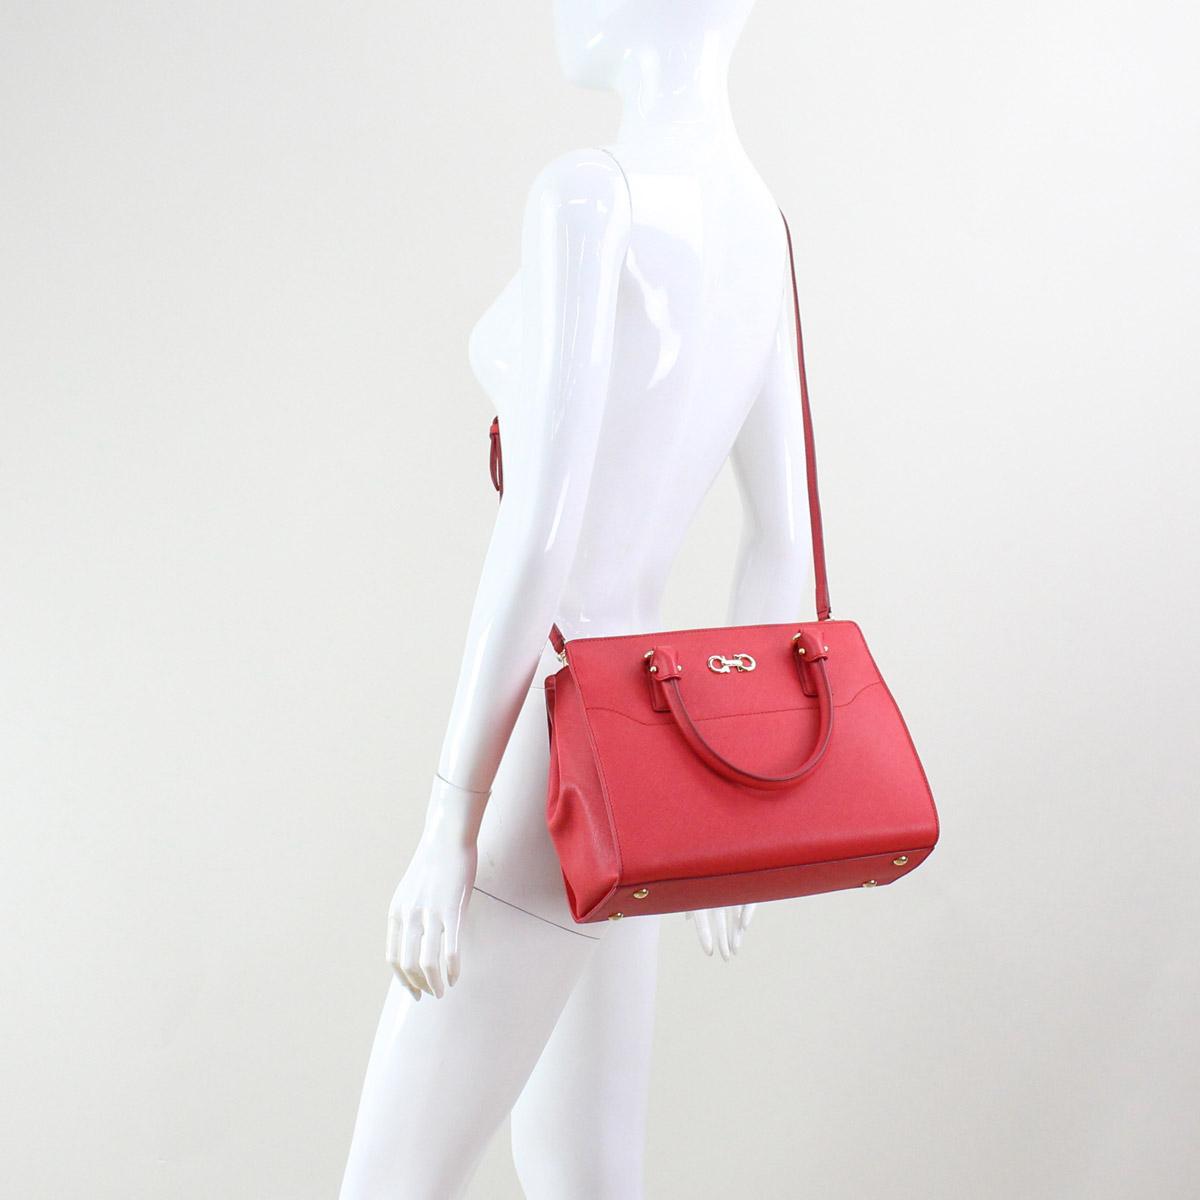 Bighit The total brand wholesale  Ferragamo (FERRAGAMO) BEKY handbag ... 5a6a0abd24e39